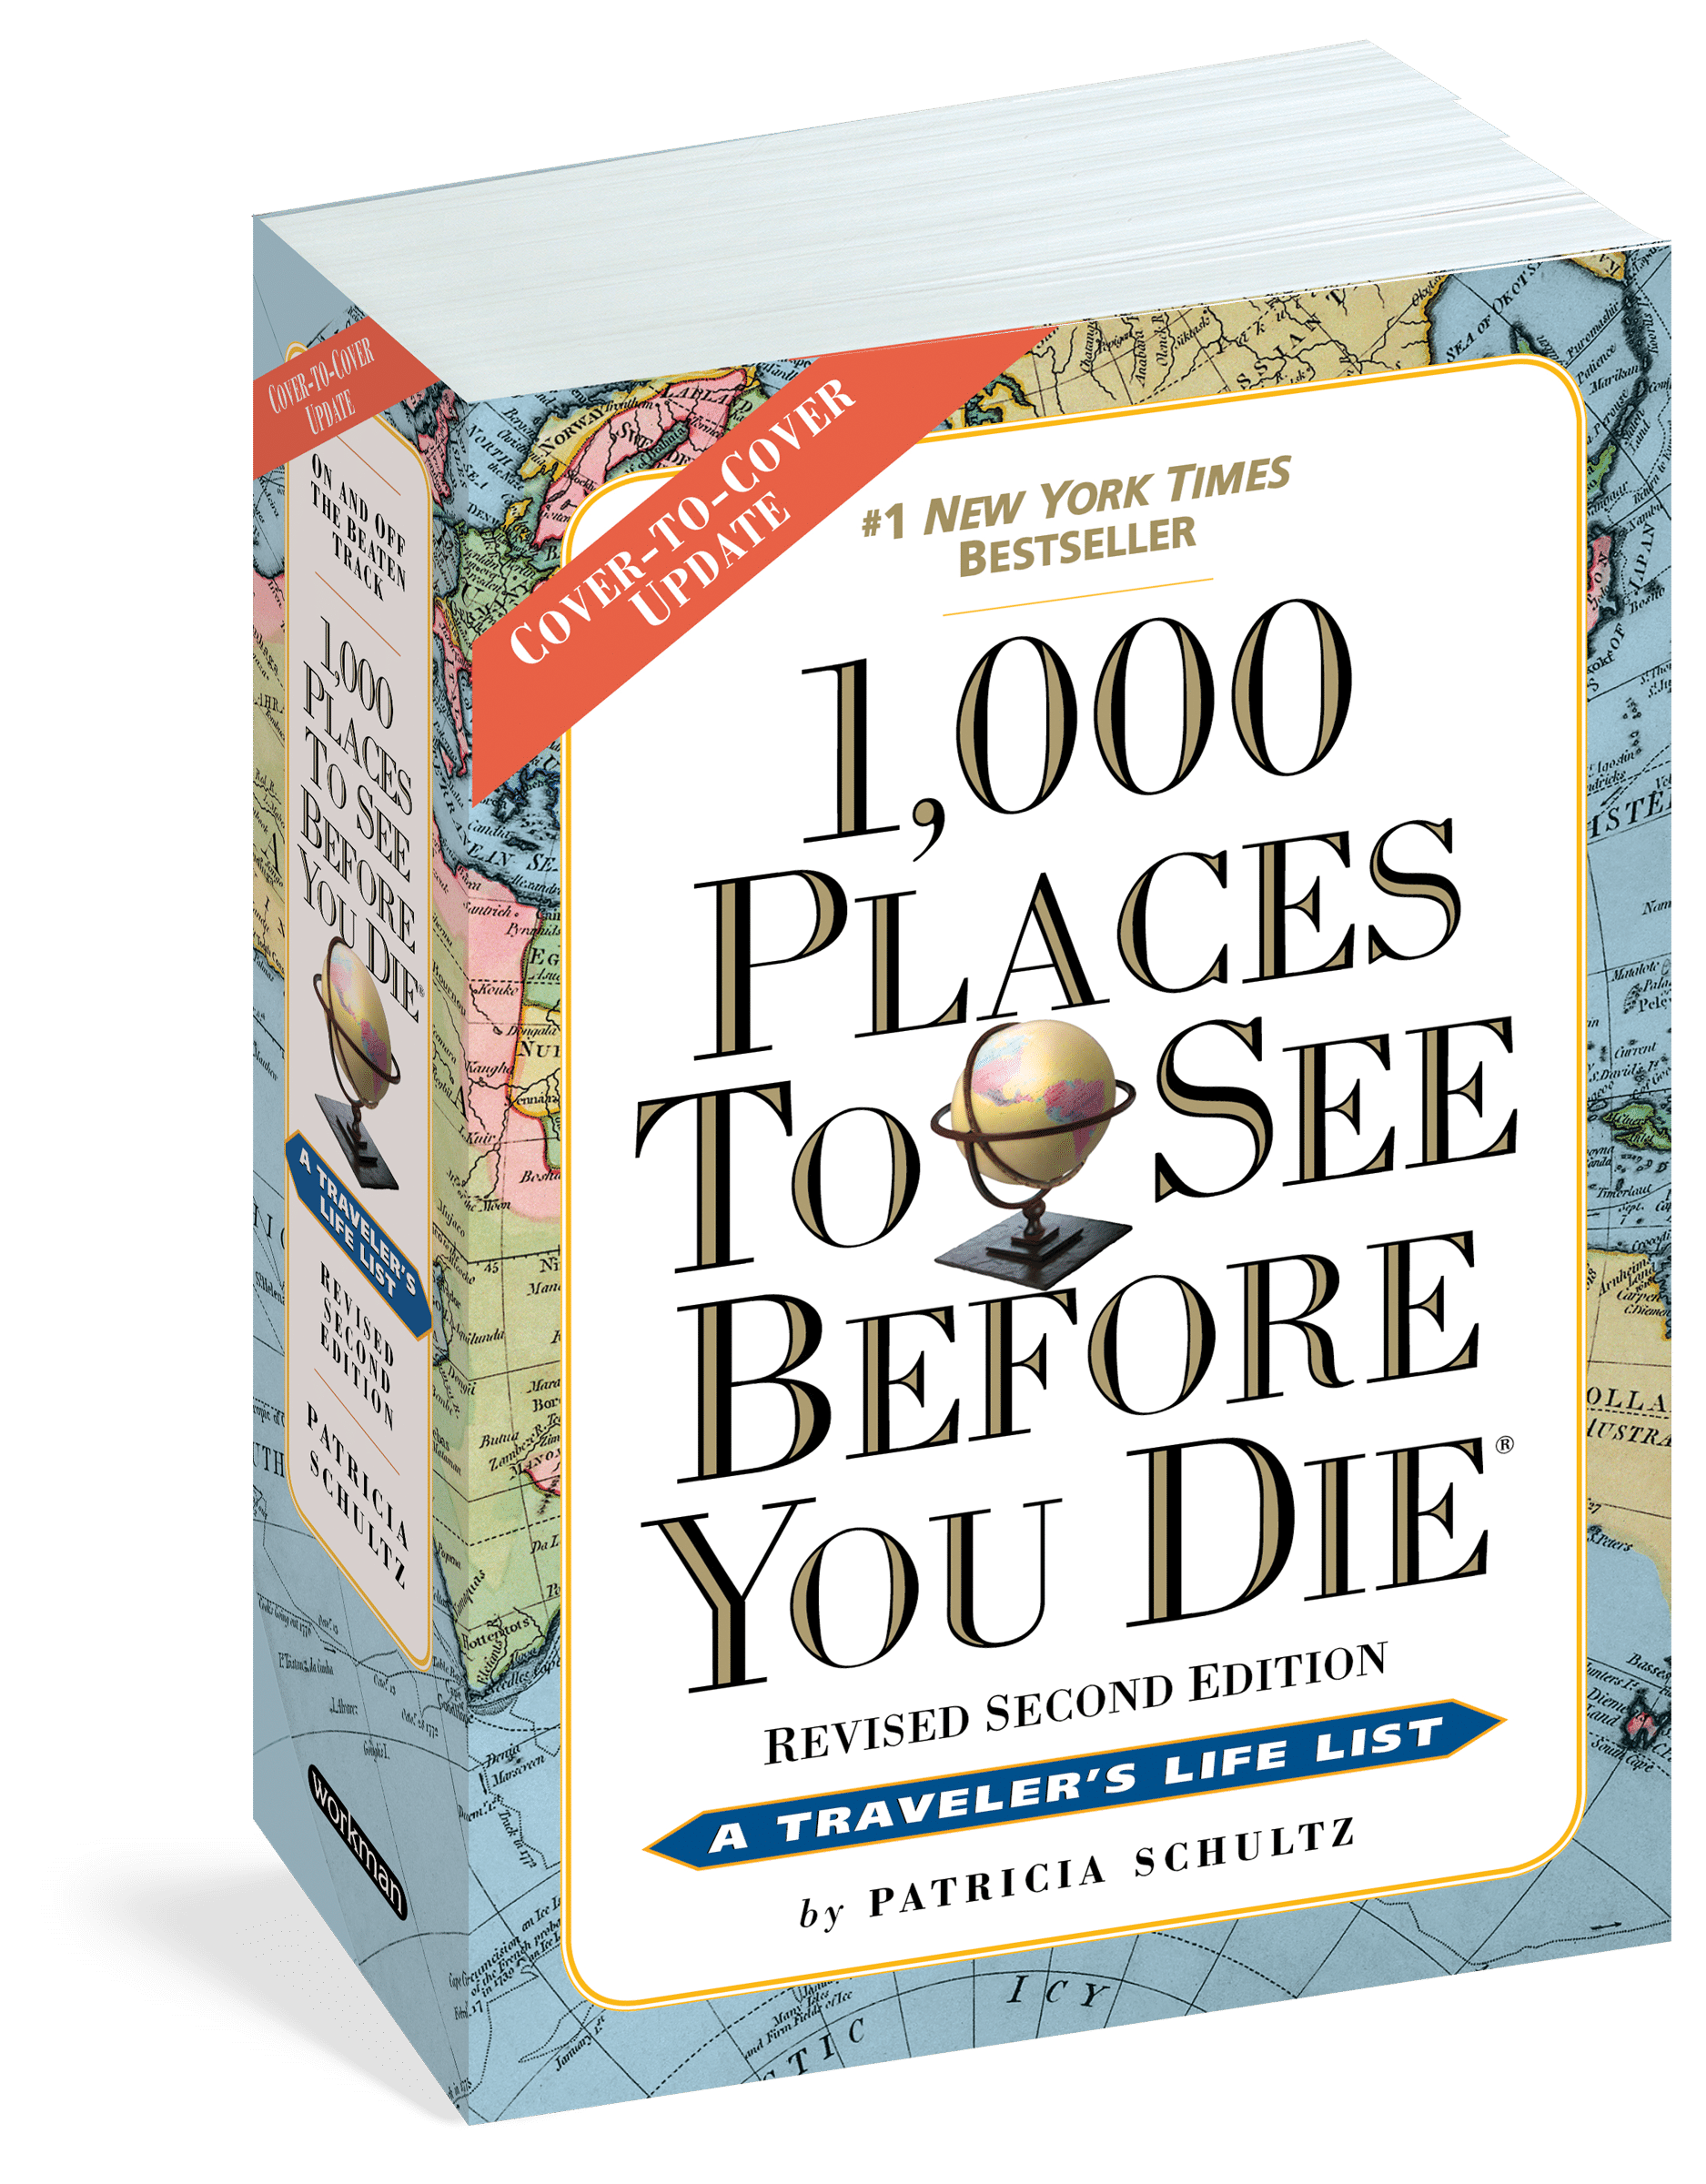 40th-birthday-gift-ideas-book